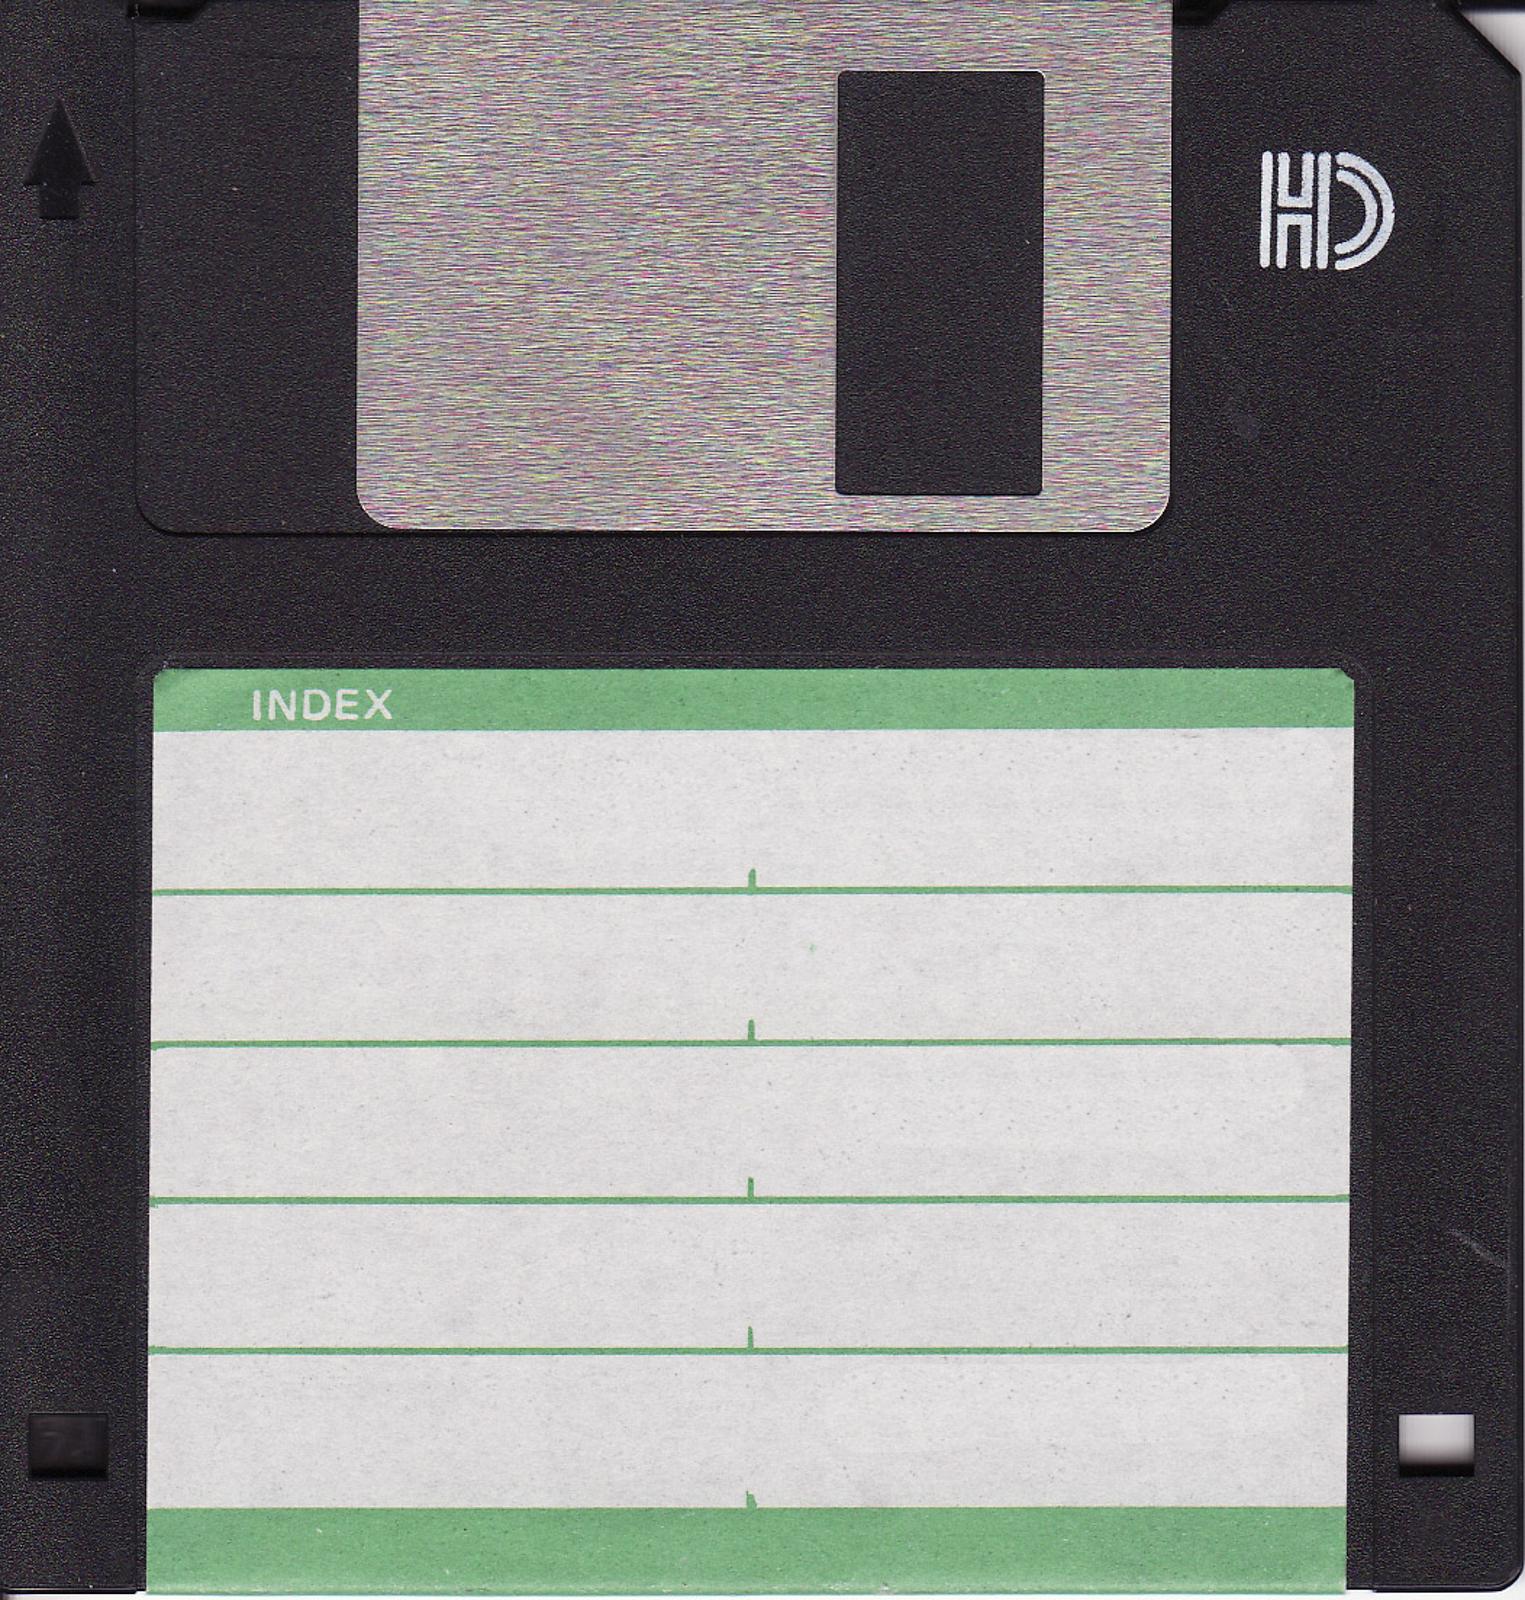 Floppy_disk_300_dpi-2.jpg